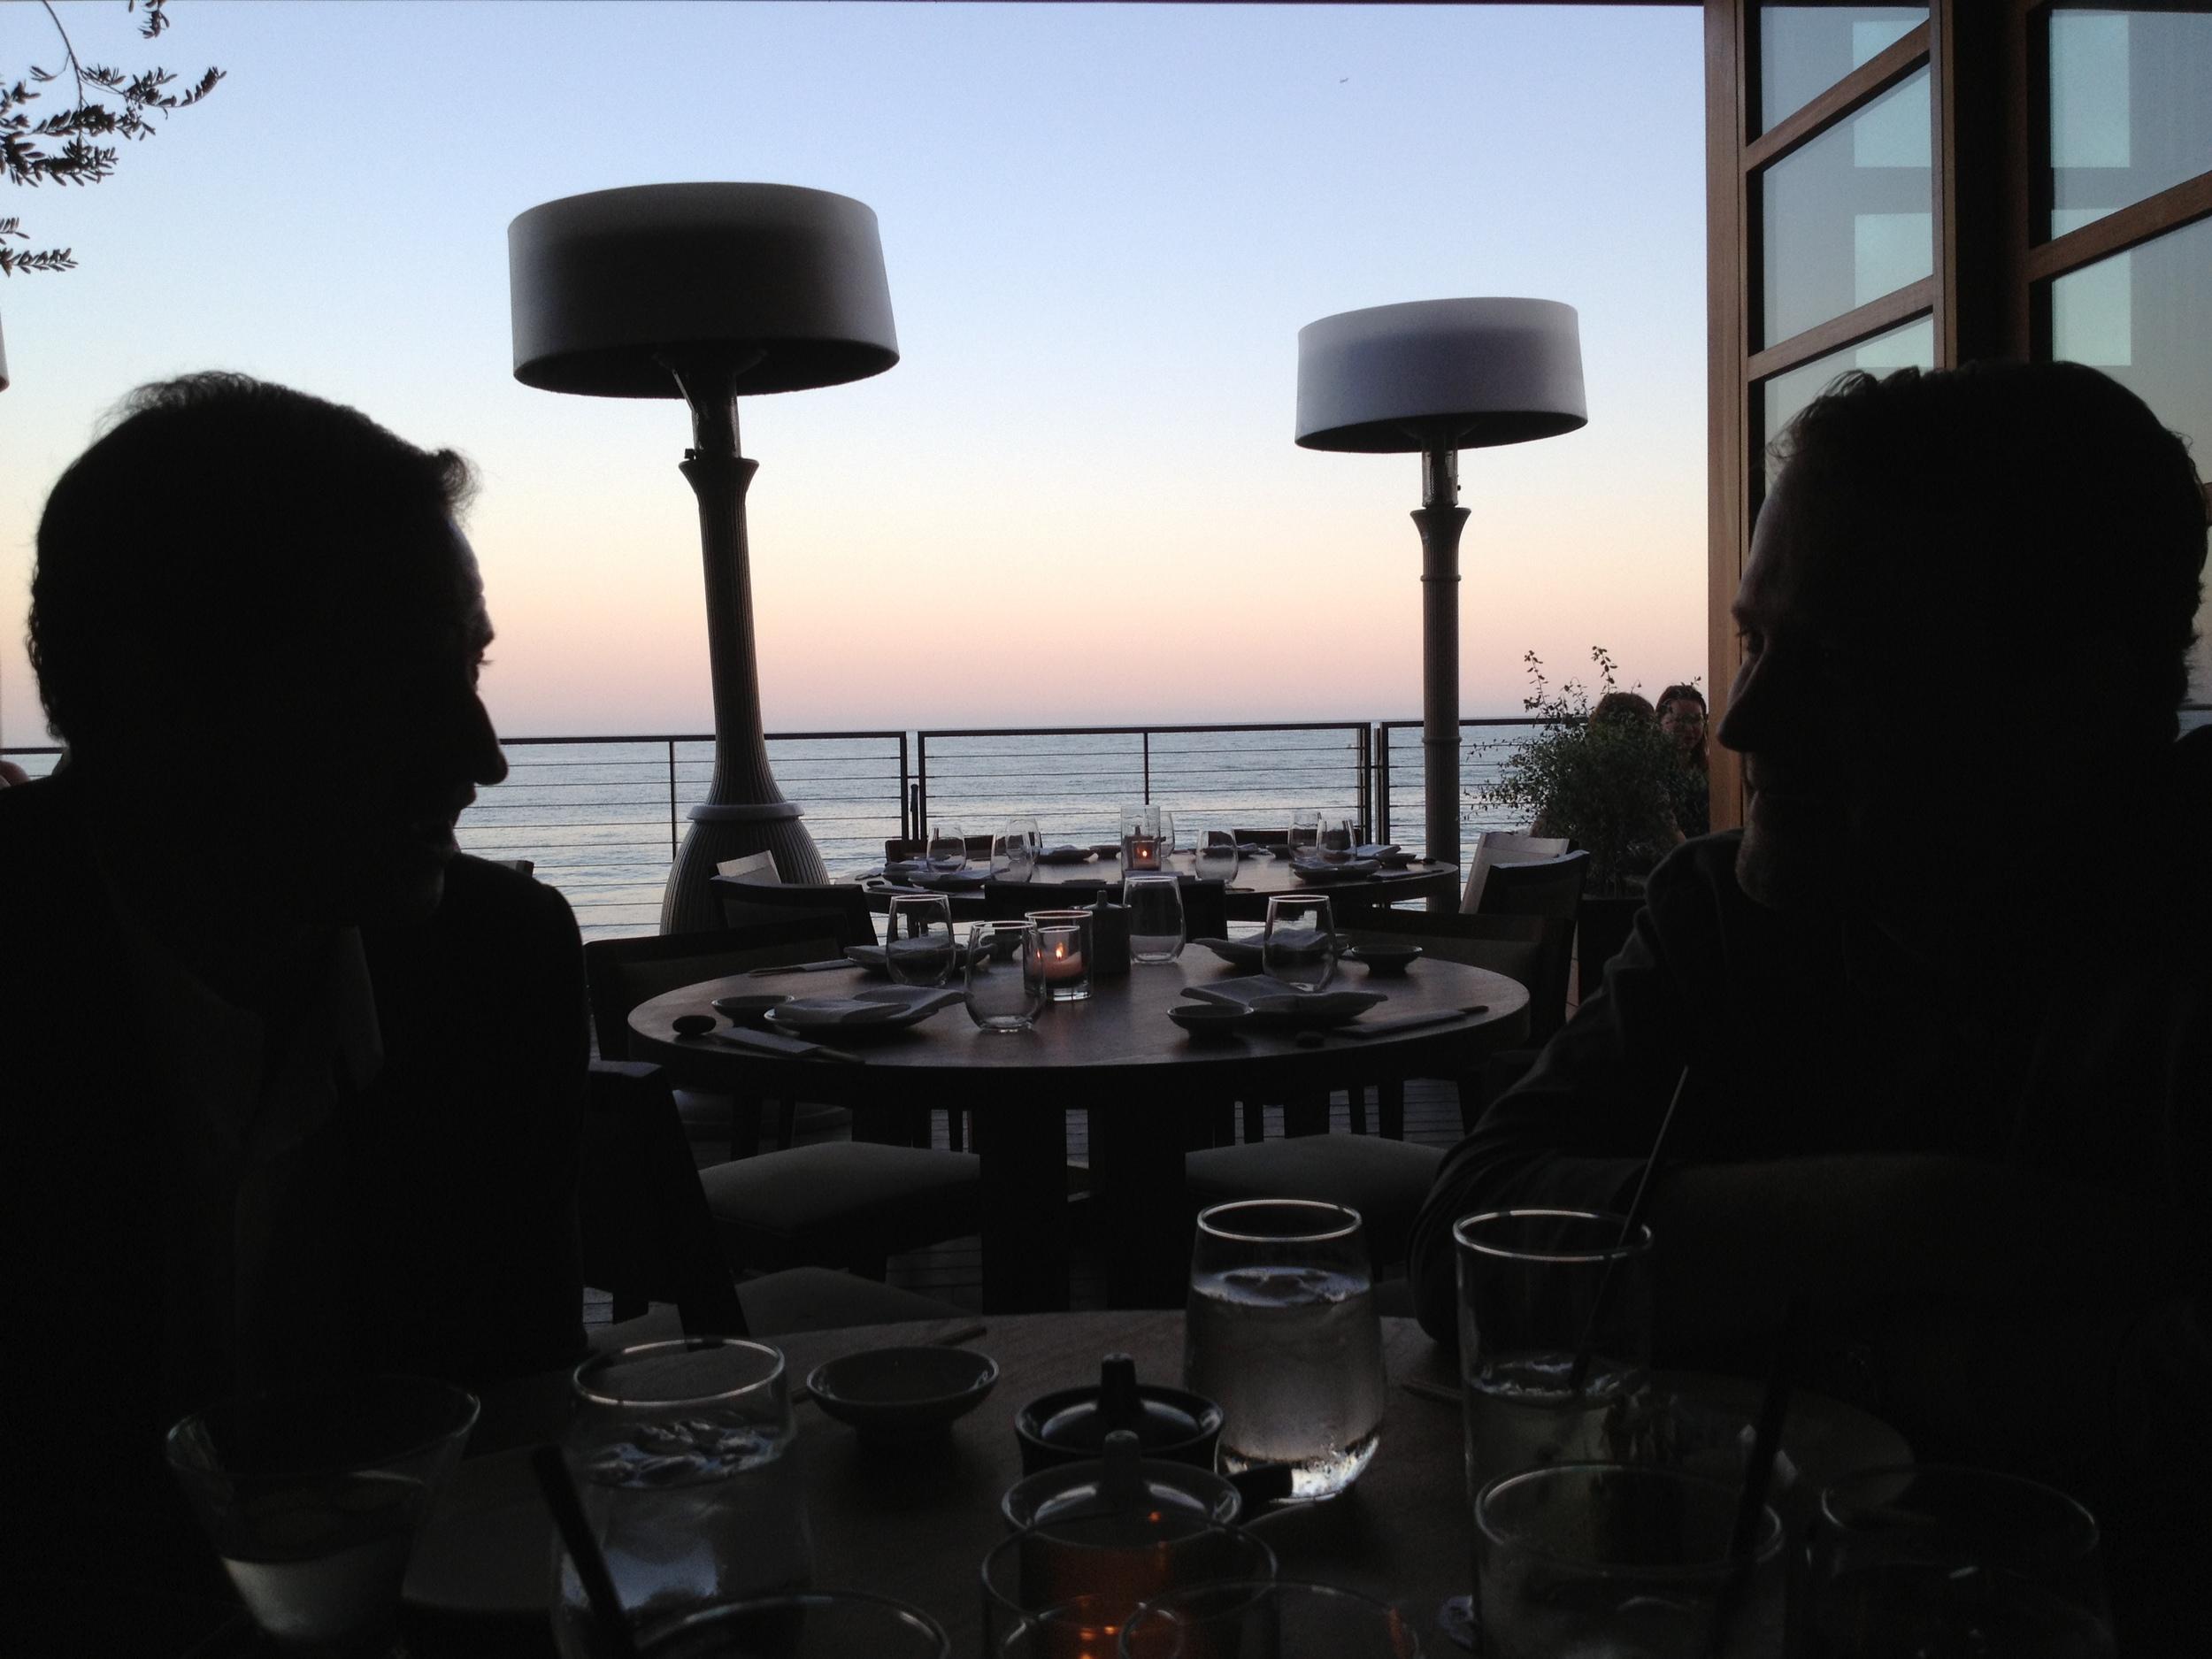 Photo shot at Nobu Malibu. Pictured here: Michael Meyers and Michael Druyanoff.